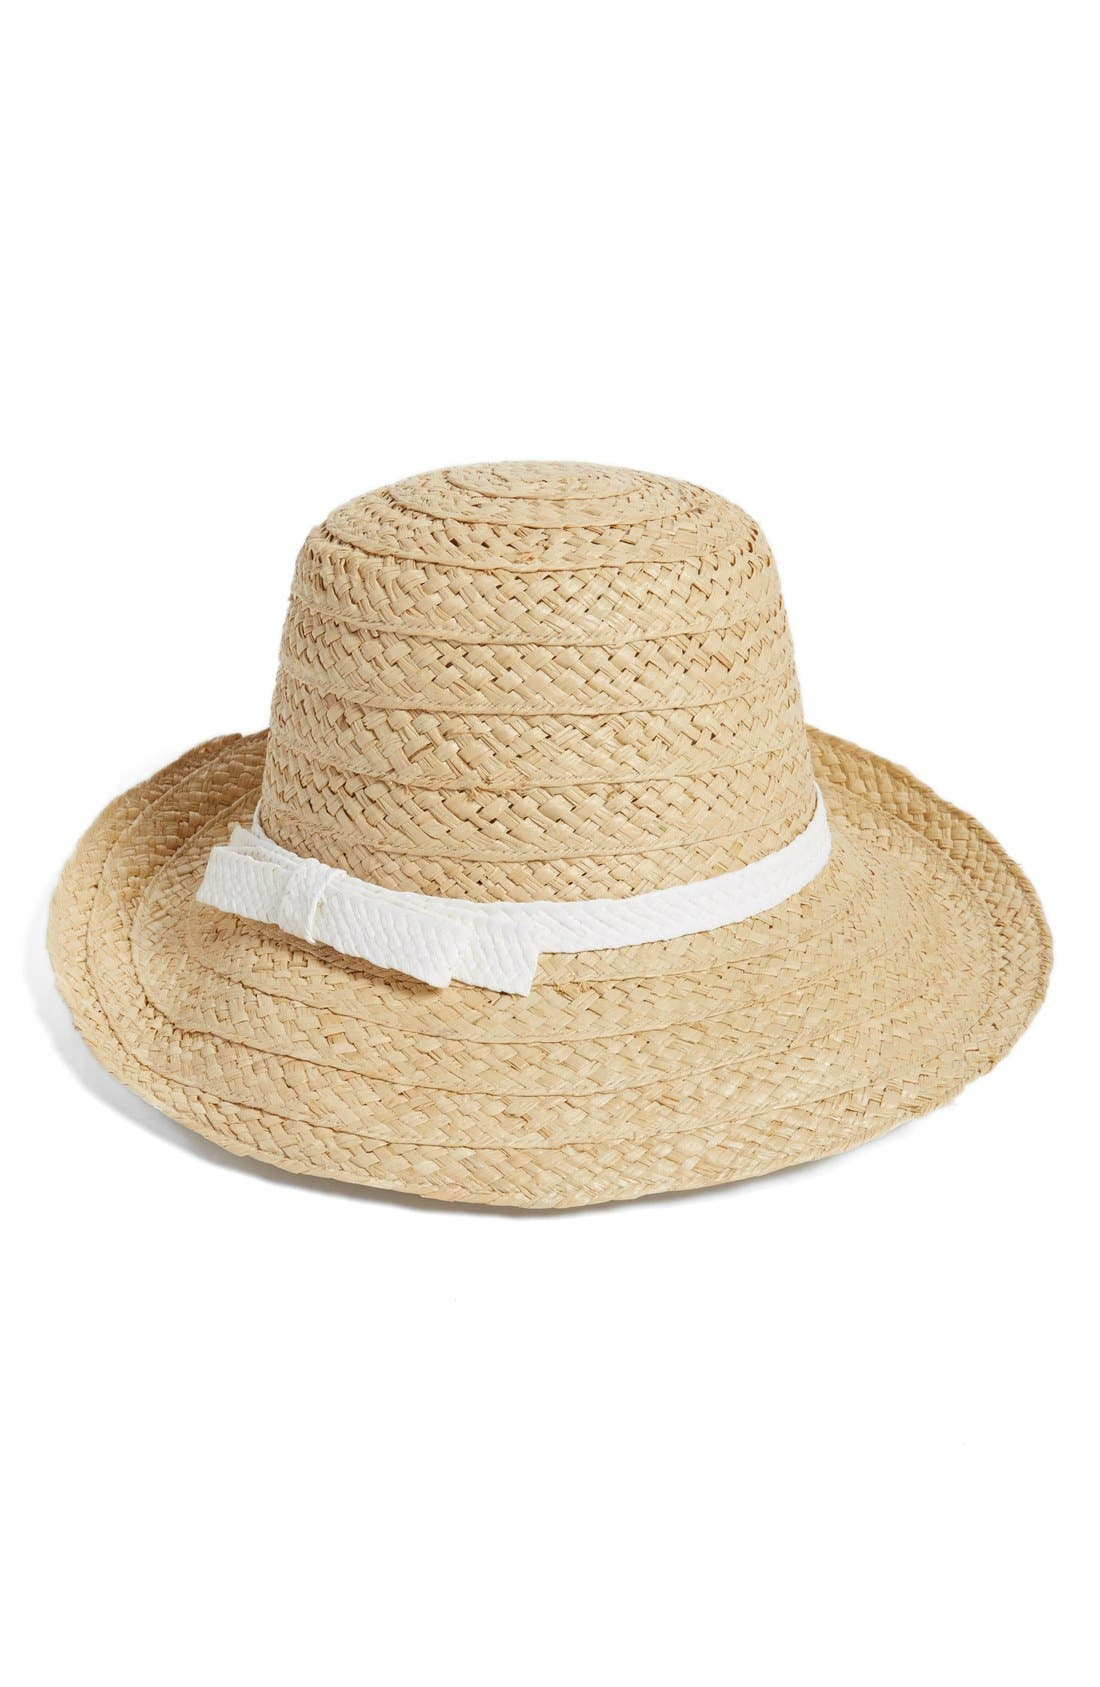 Main Image - kate spade new york asymmetrical sun hat